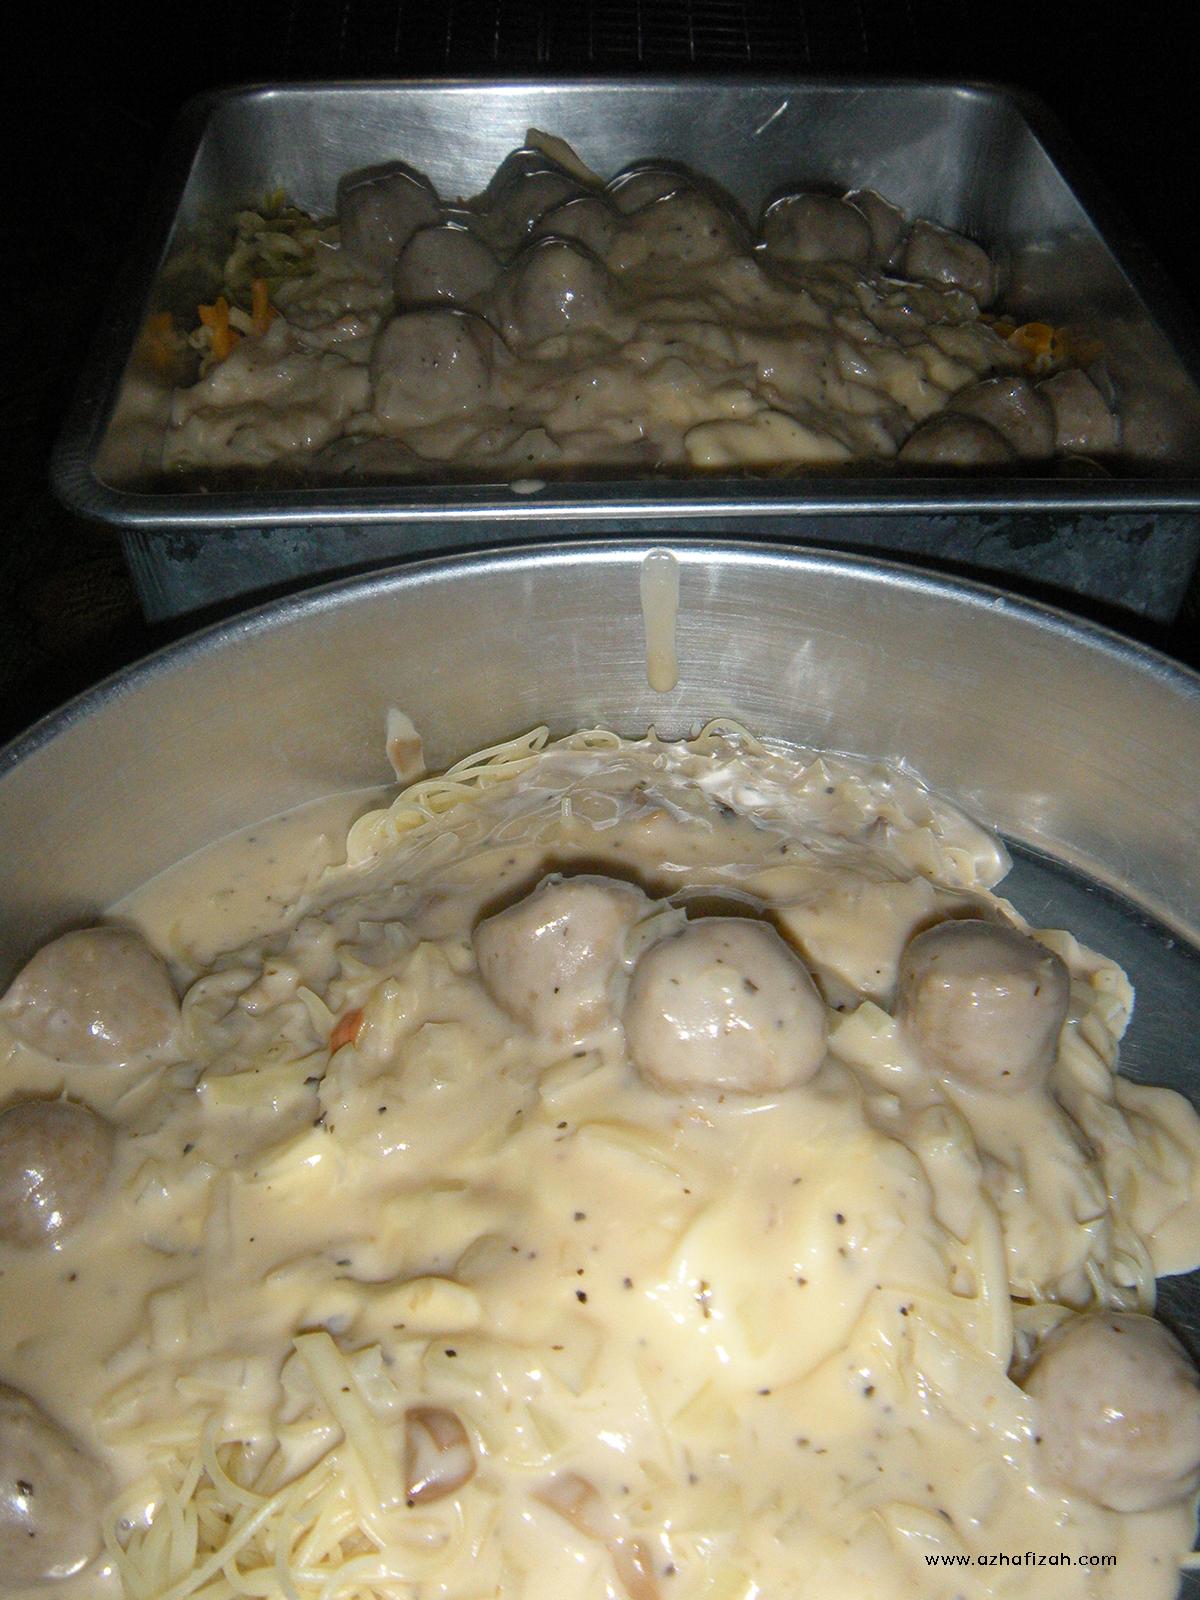 Resepi Spaghetti/Pasta Carbonara Cheesy Creamy